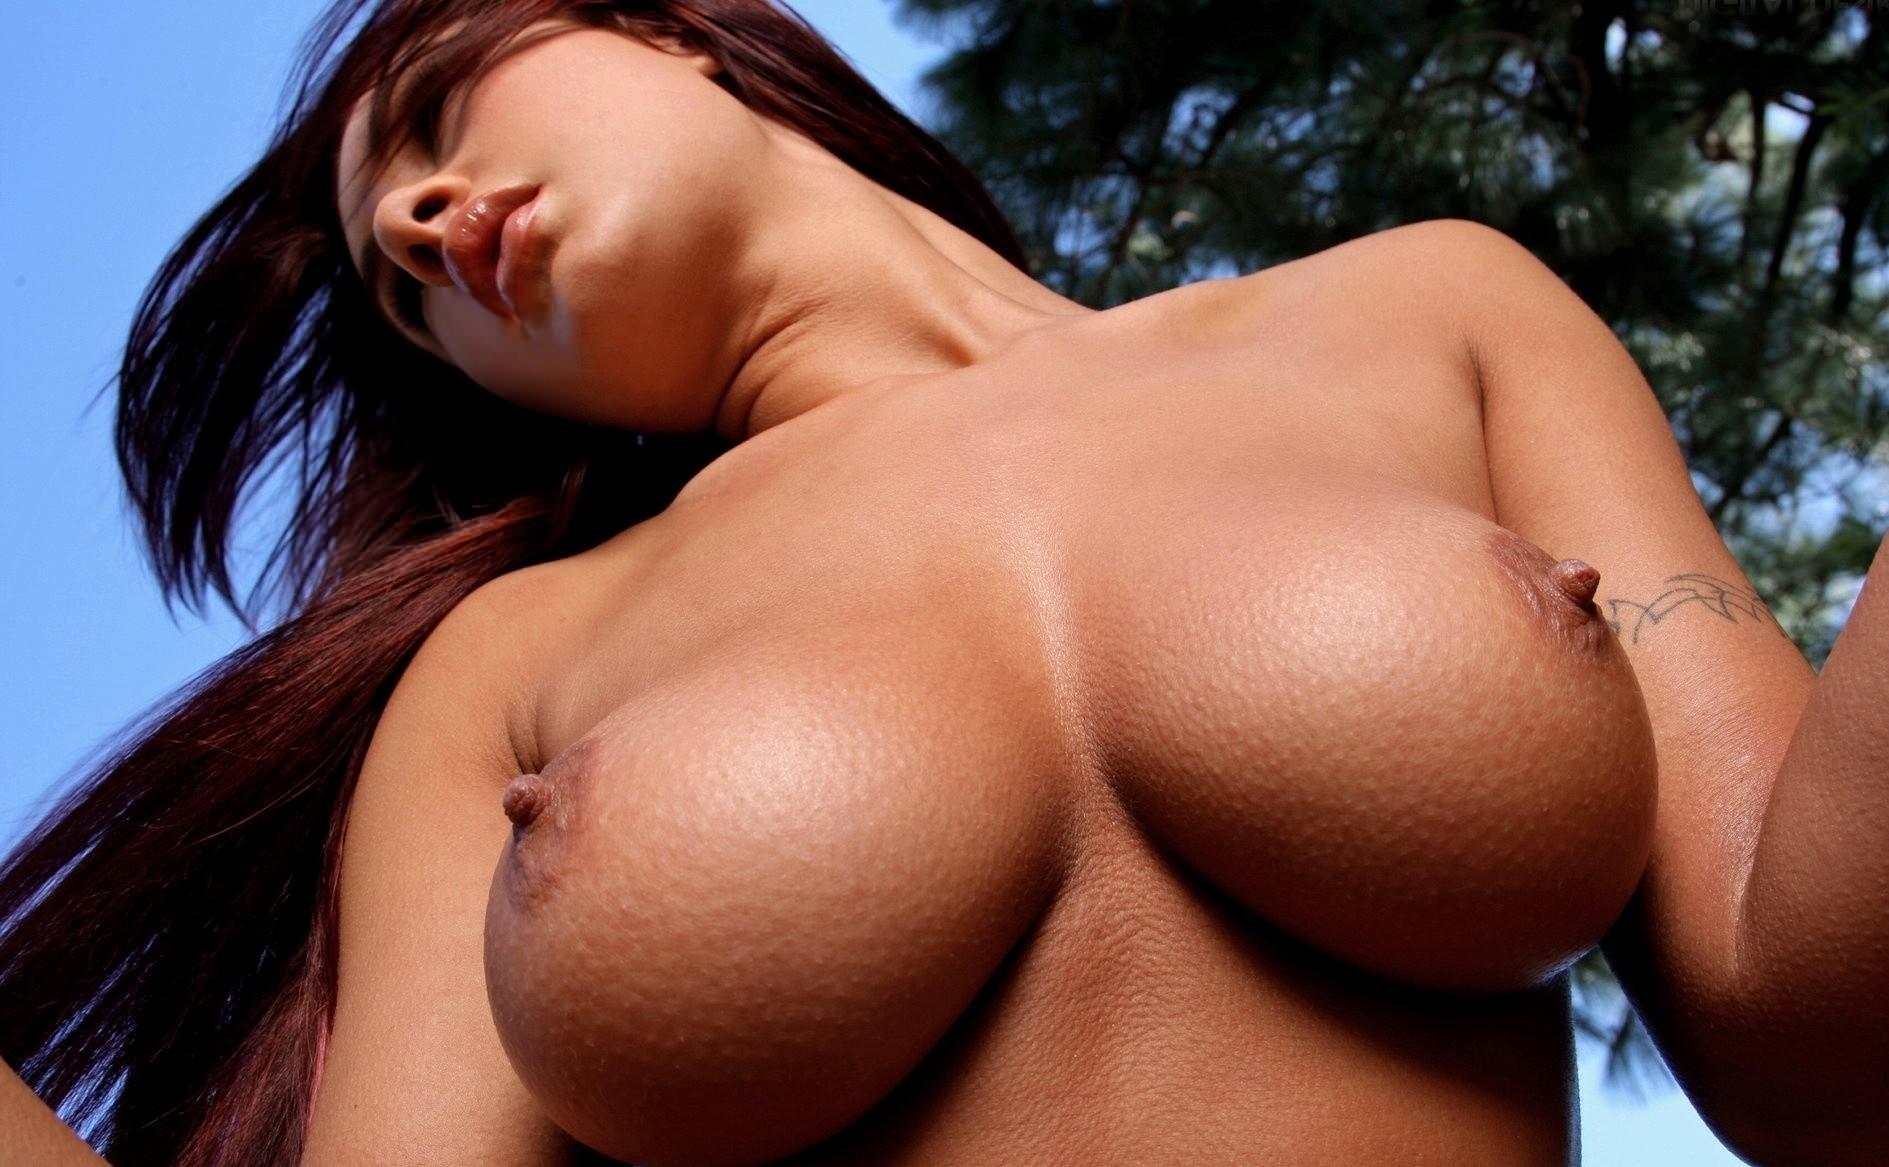 Big Ass Small Tits Teen